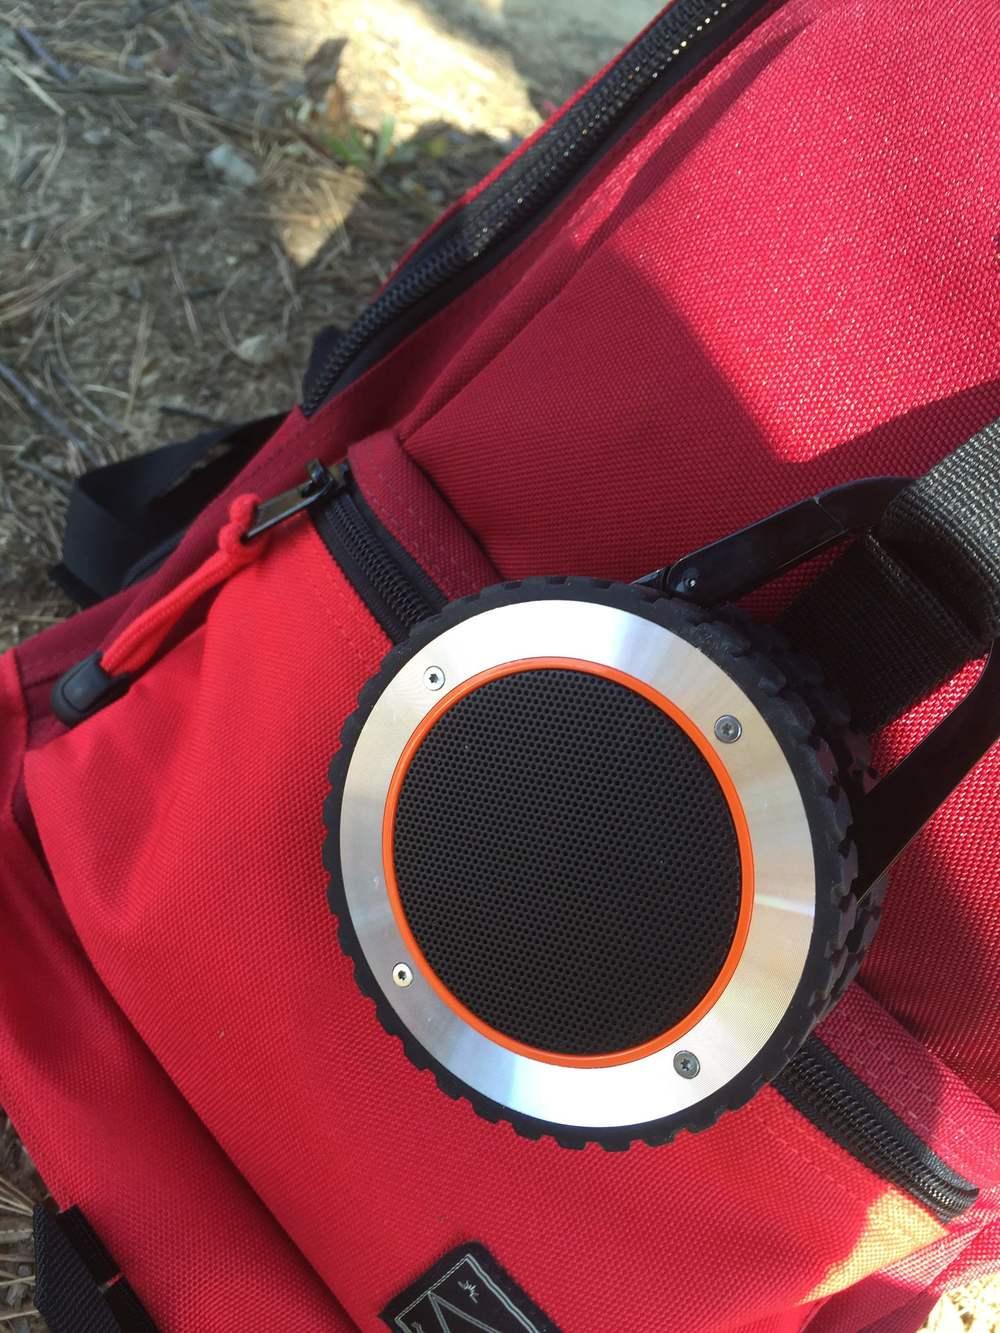 FRESHeTech All-Terrain Sound Rugged Outdoor Bluetooth Speaker Review